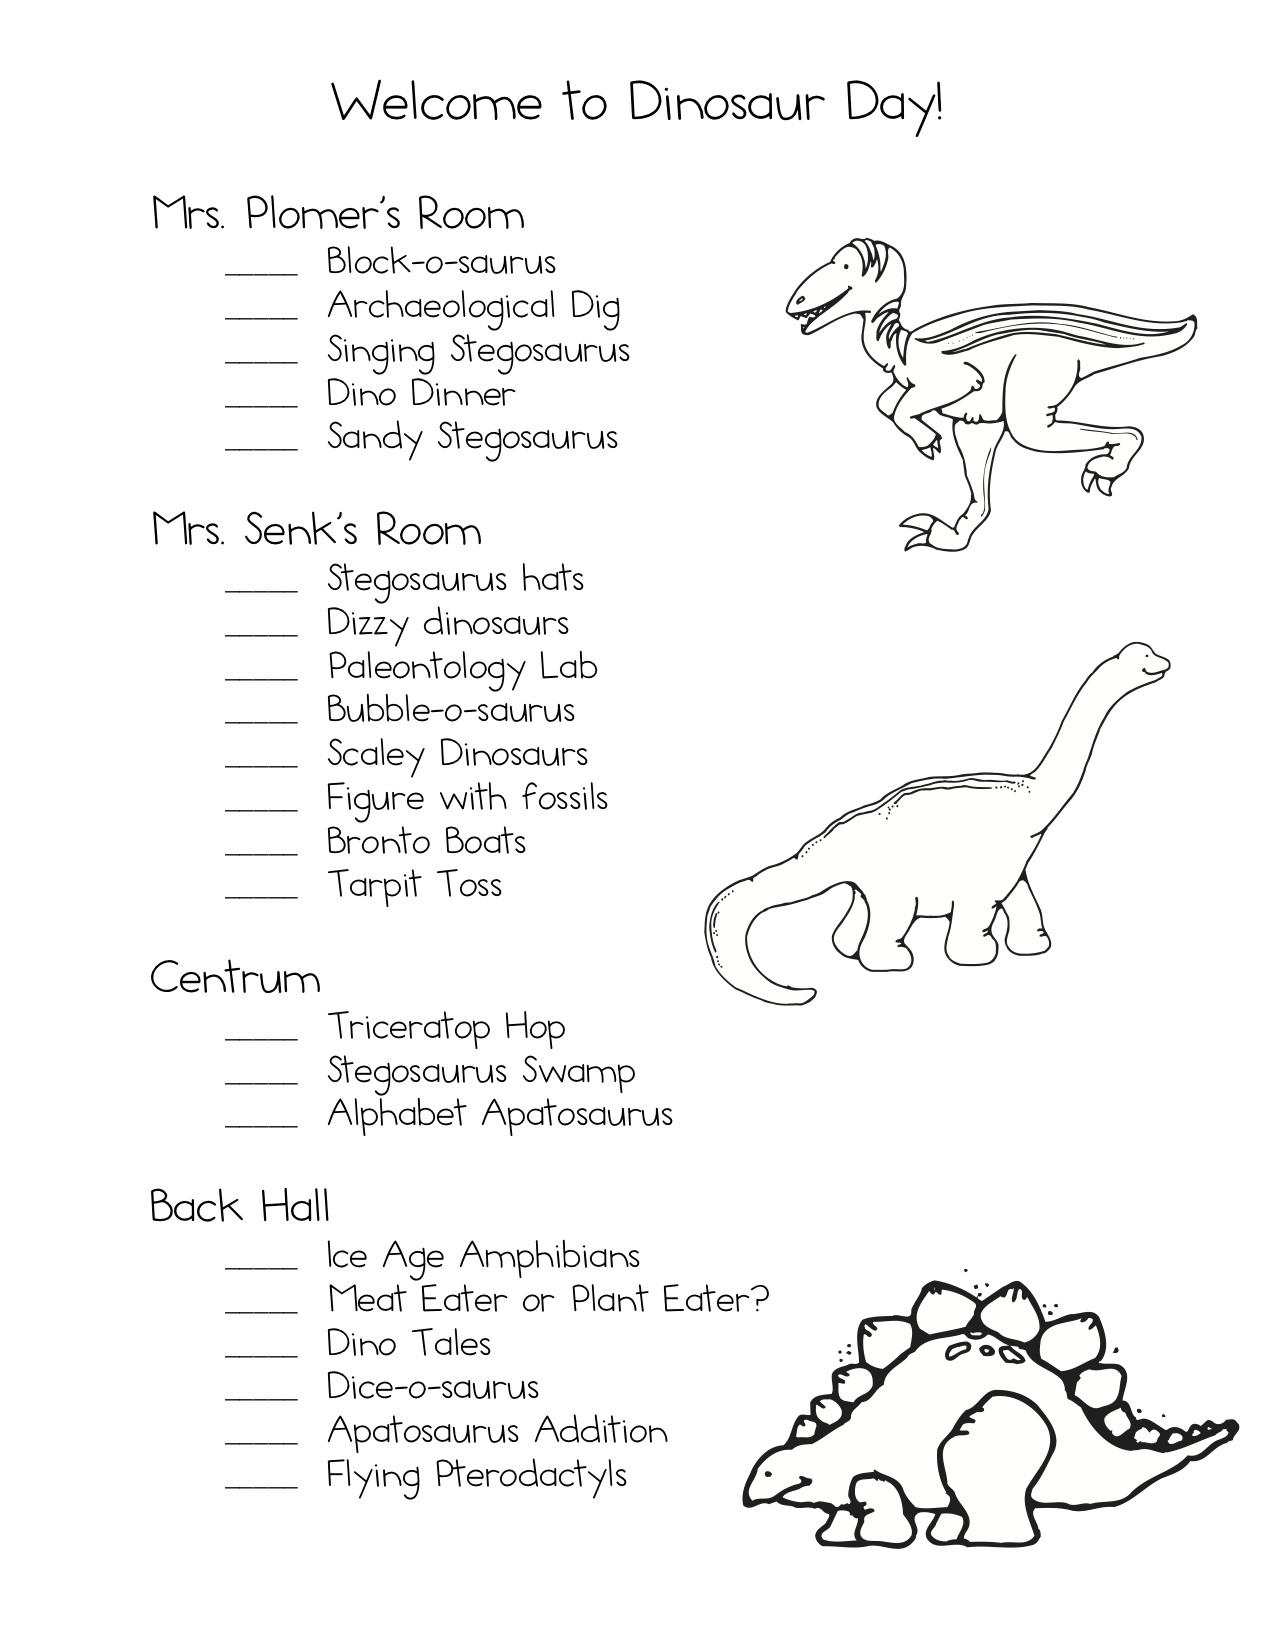 delightful dinosaur day kindergarten nana. Black Bedroom Furniture Sets. Home Design Ideas